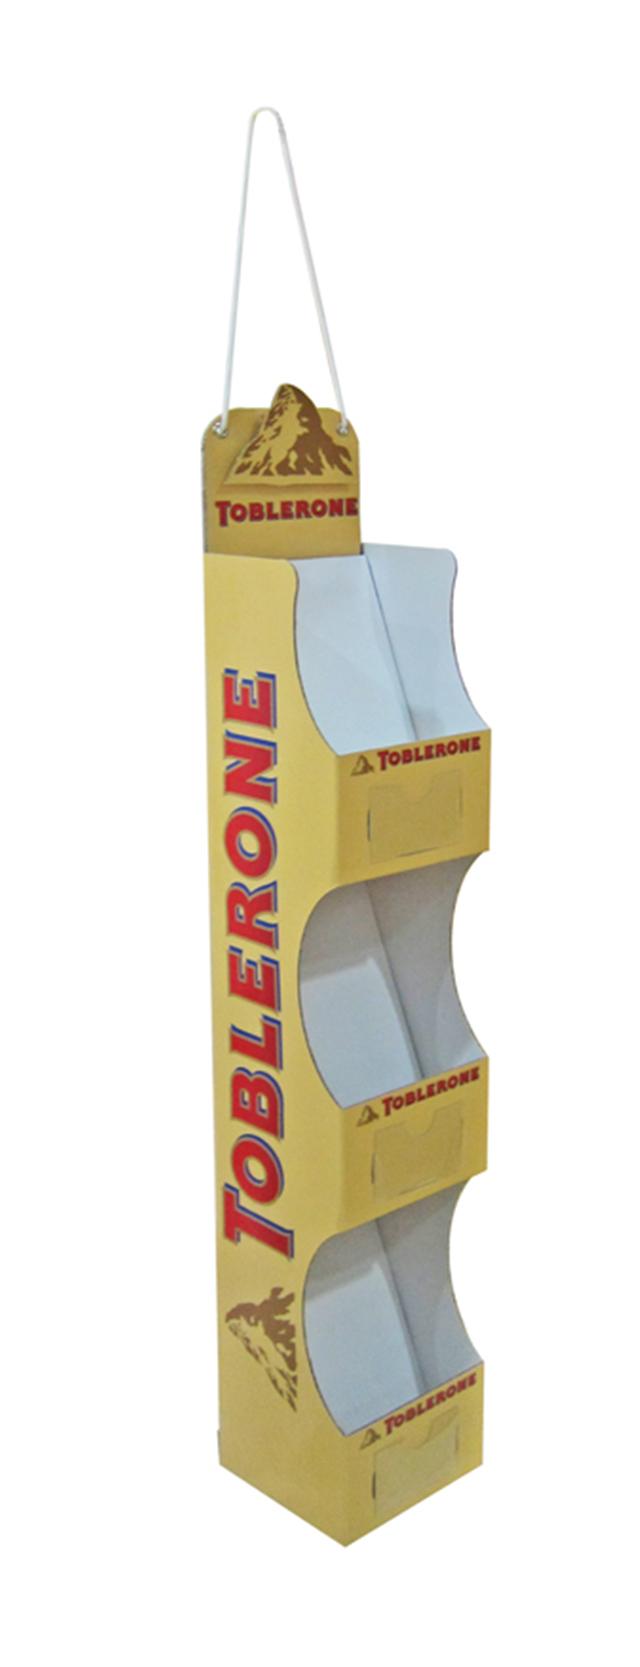 toblerone hanging front